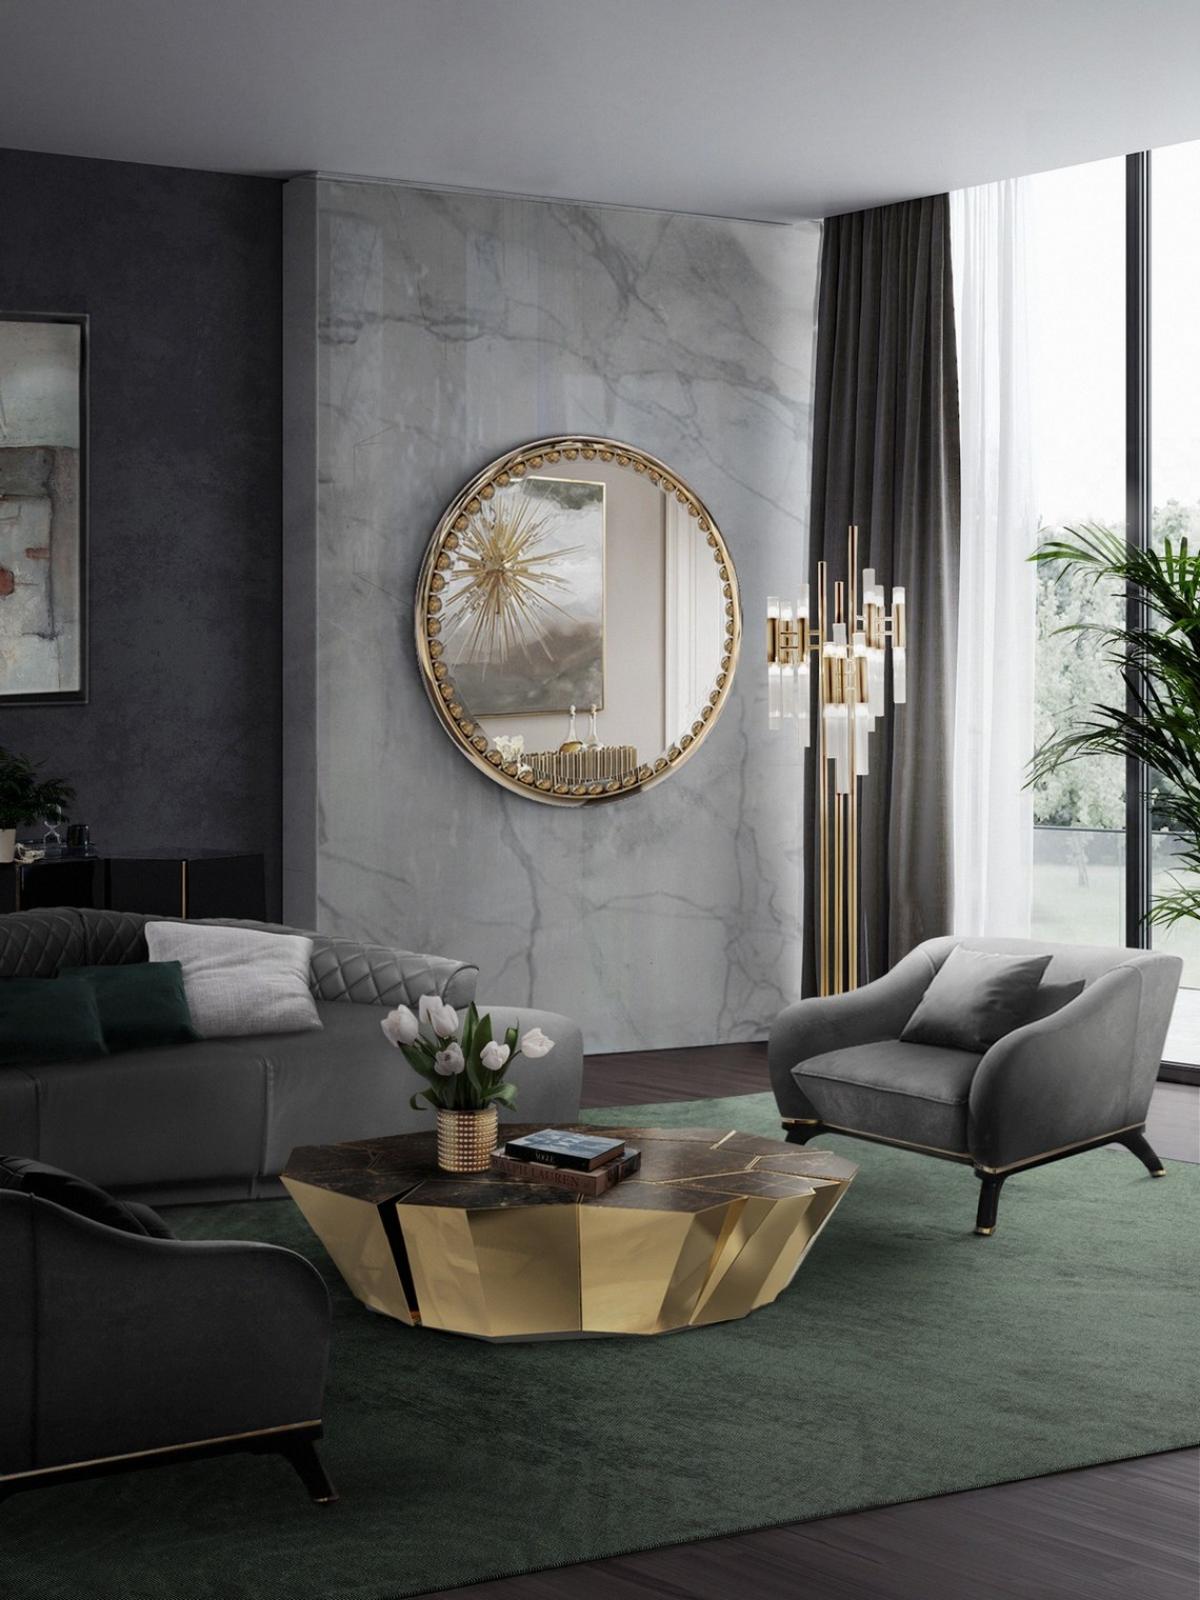 Contemporary Center Tables For Contemporary Living Rooms Contemporary Living Rooms Hottest Center Tables For Contemporary Living Rooms 4